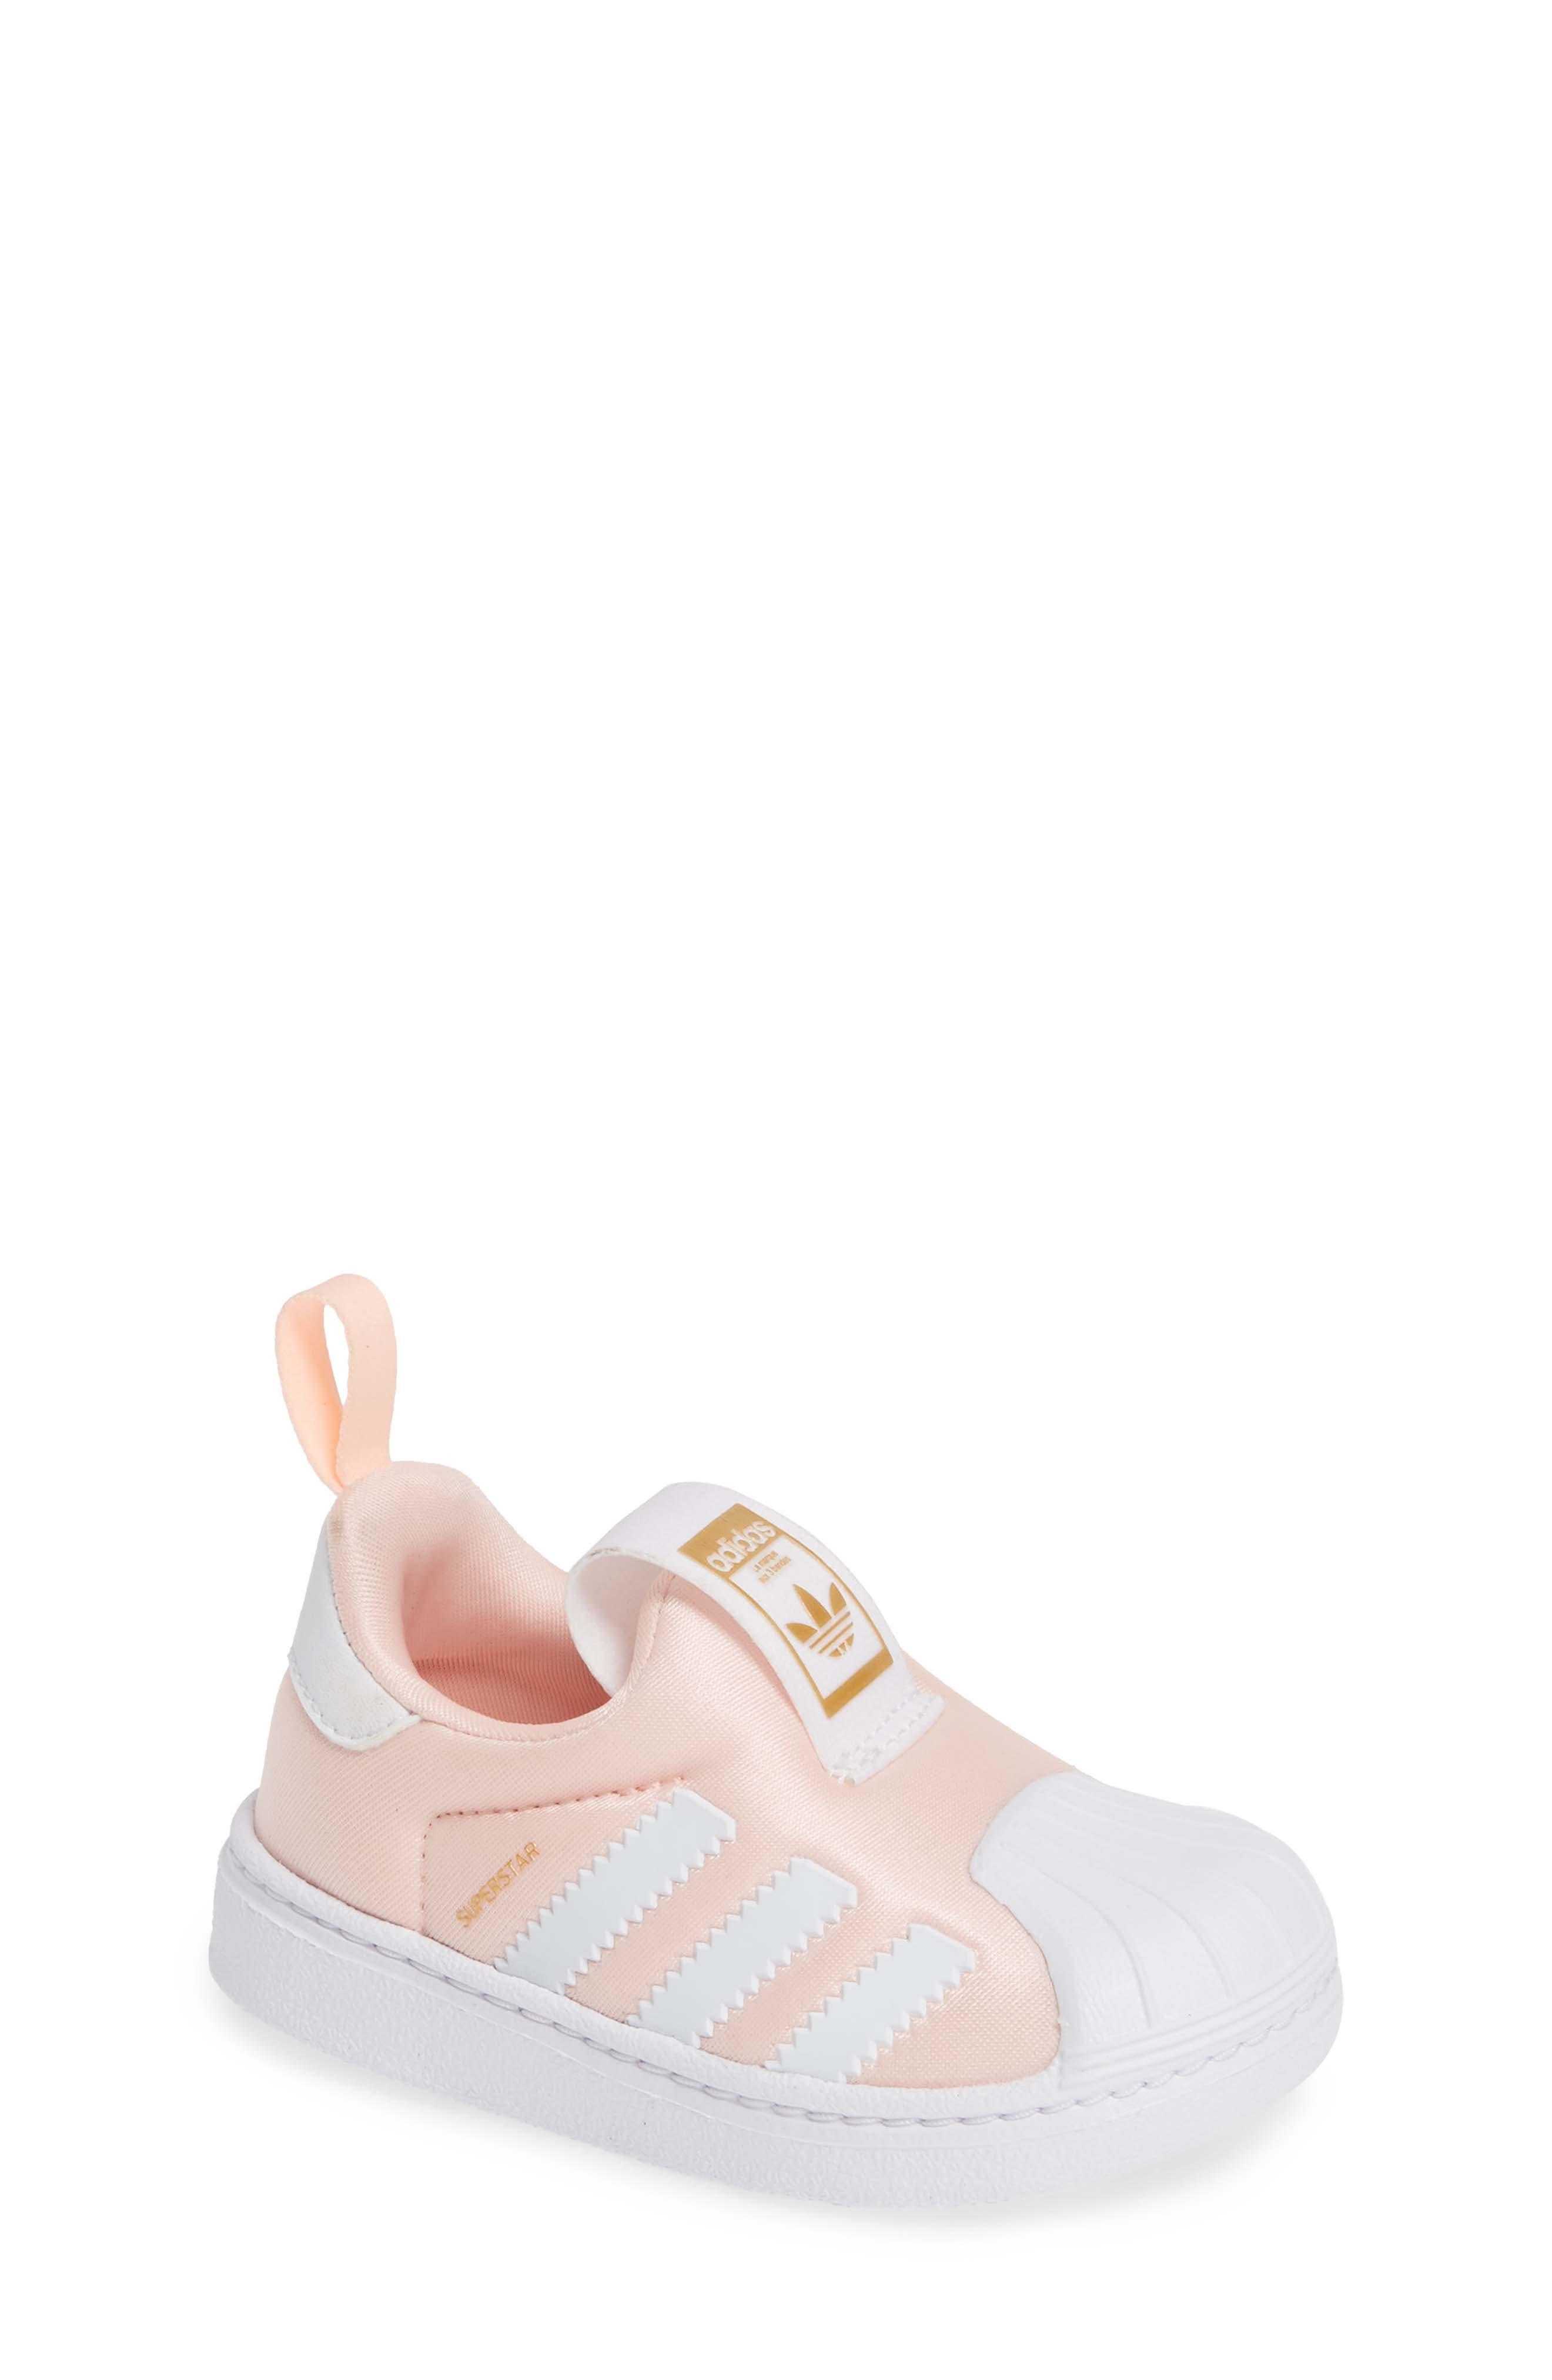 Toddler Adidas Superstar 360 I Sneaker Size 8 M  Orange